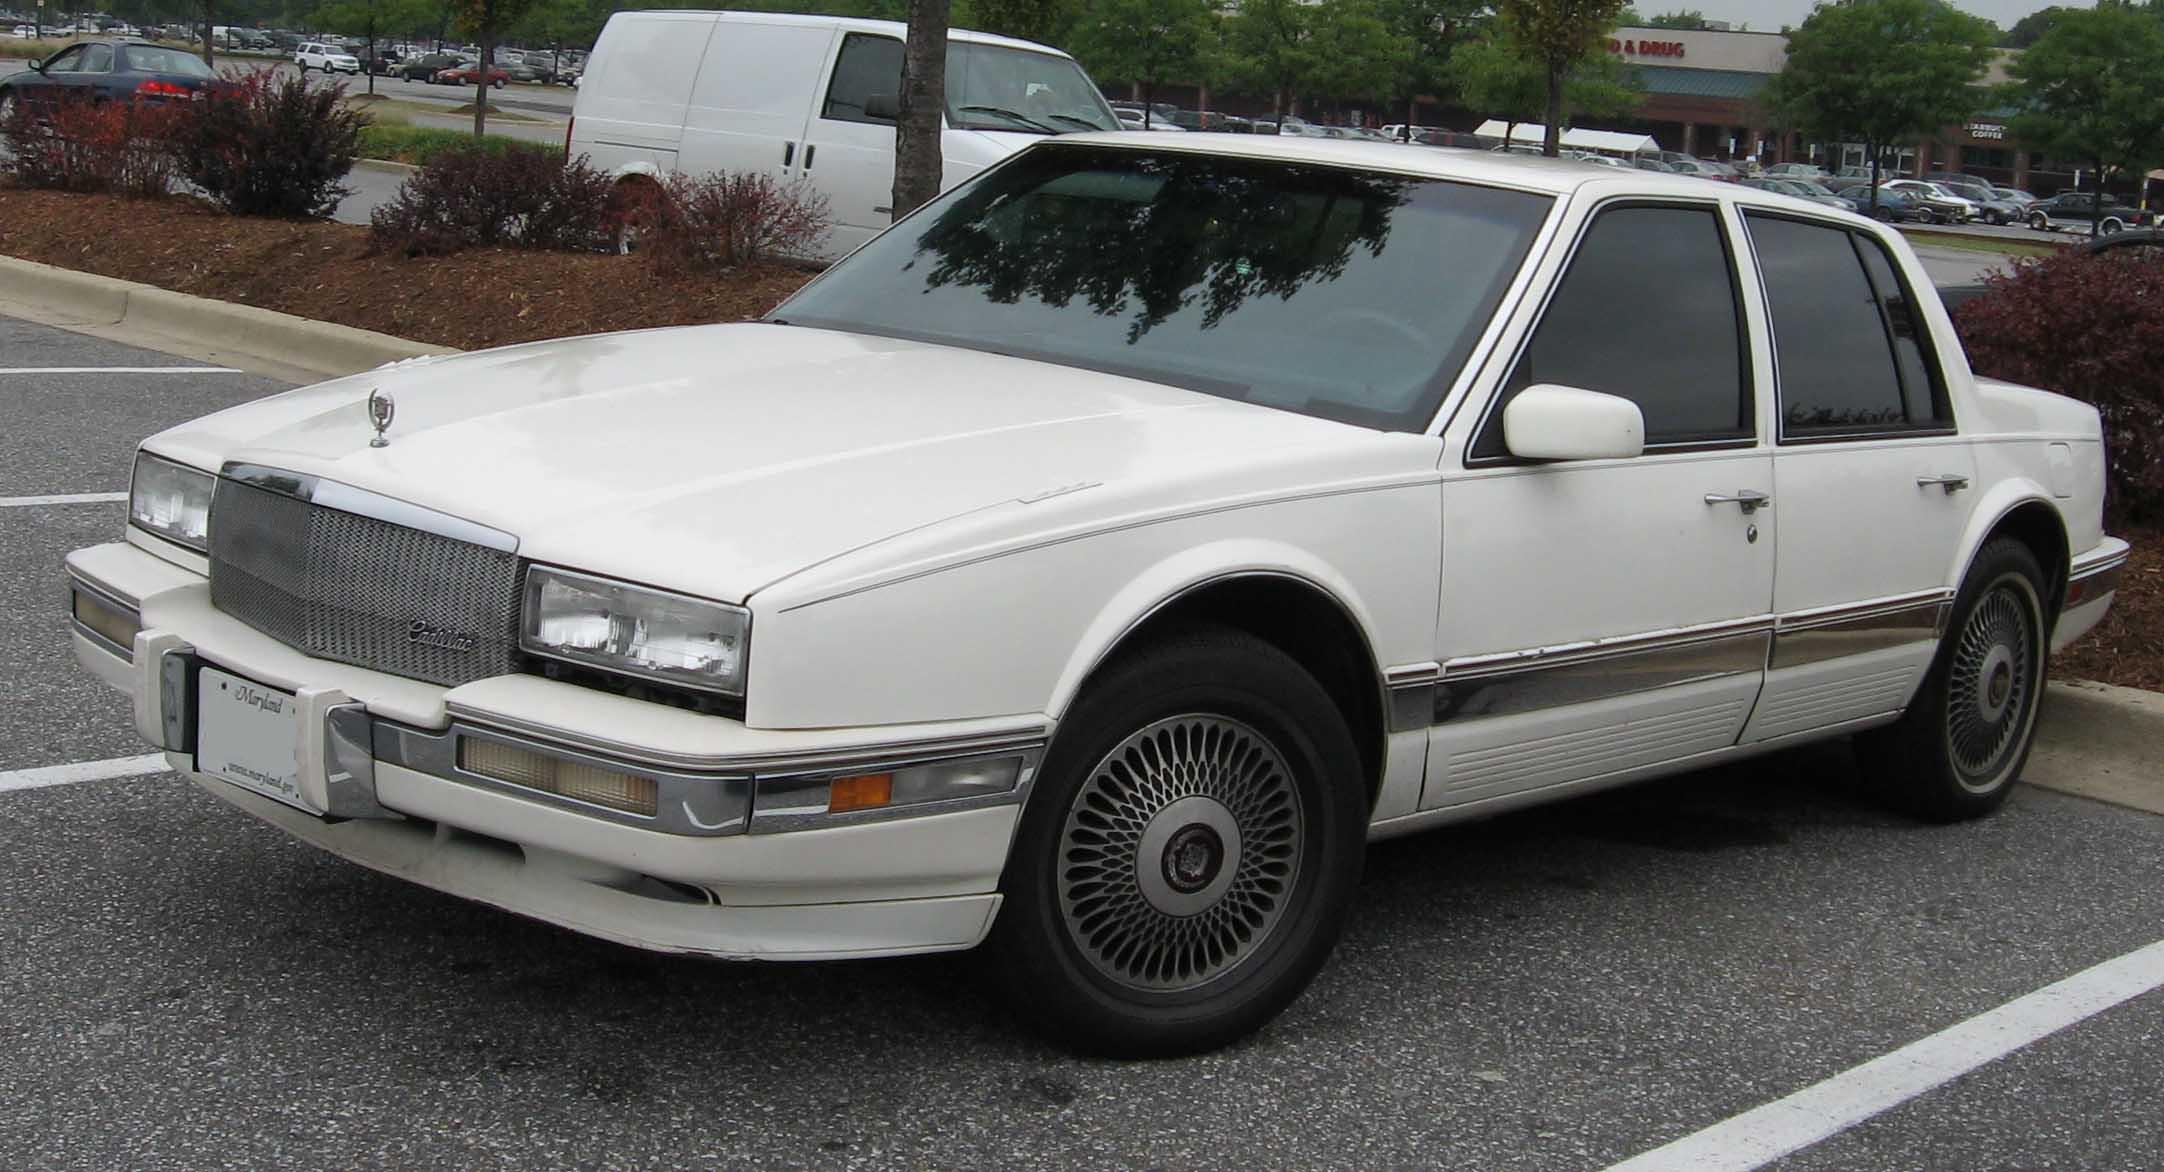 1991 Cadillac Seville Image 7